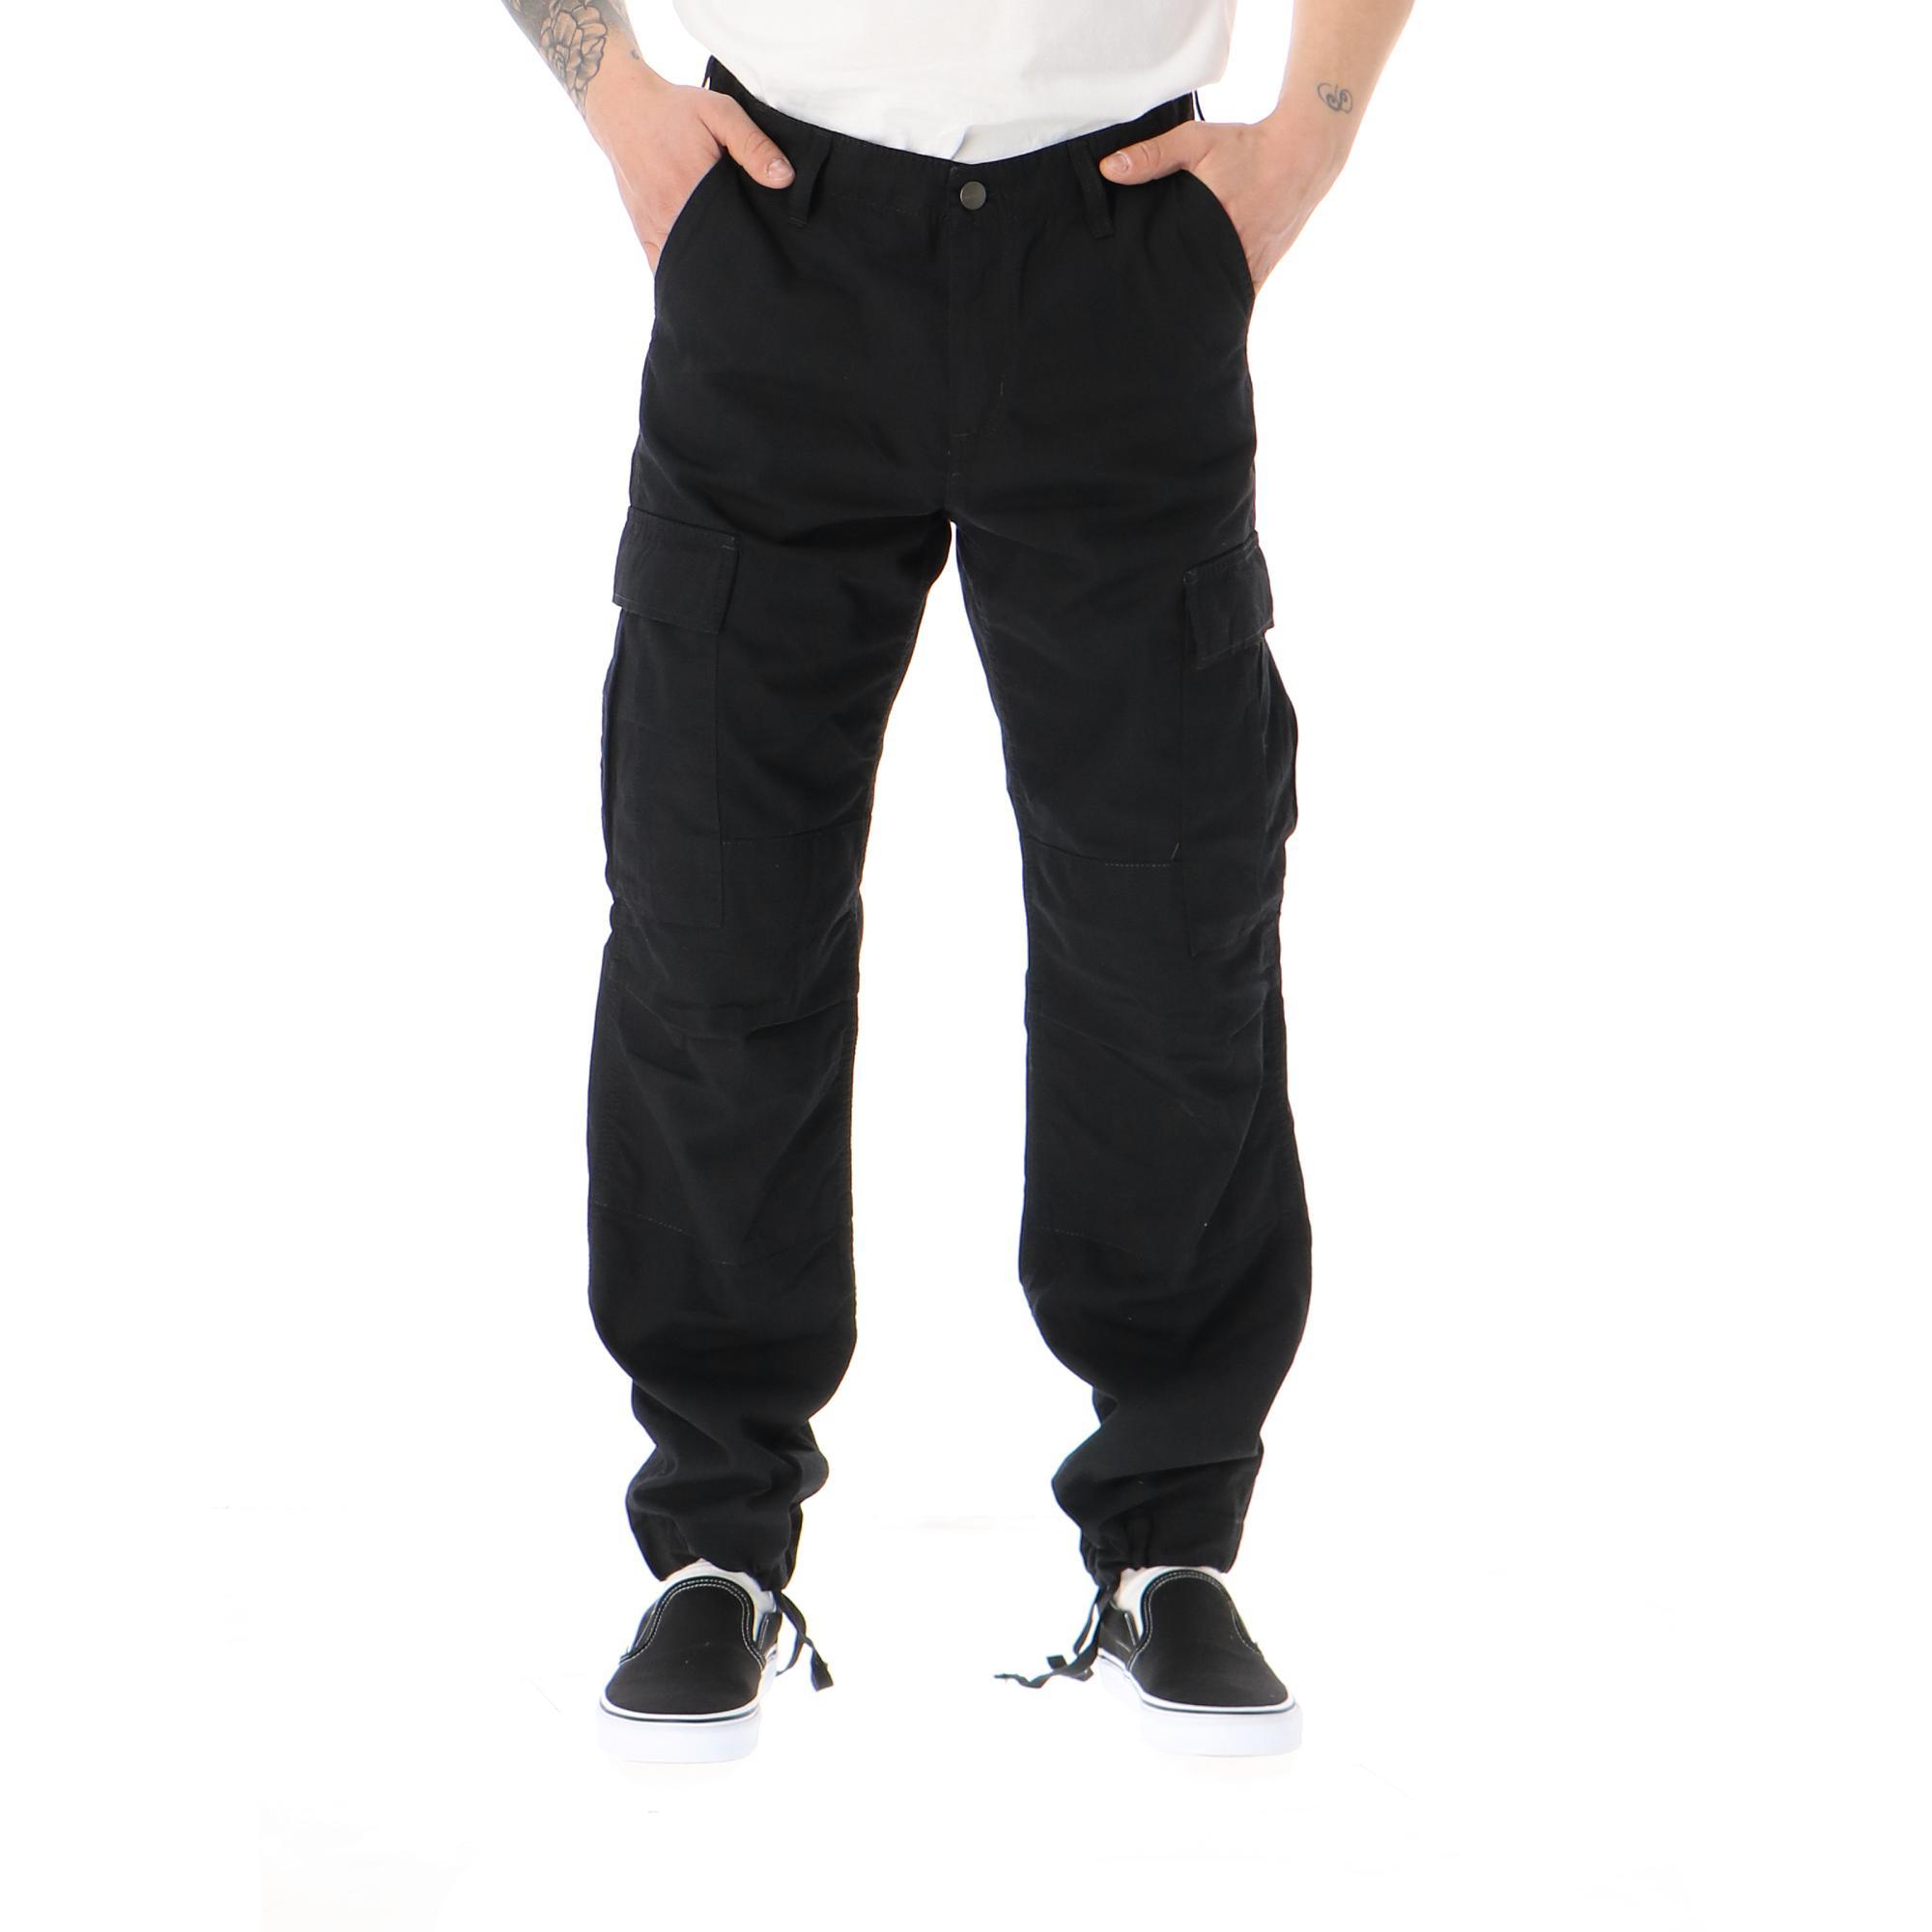 Carhartt Regular Cargo Pant Black rinsed